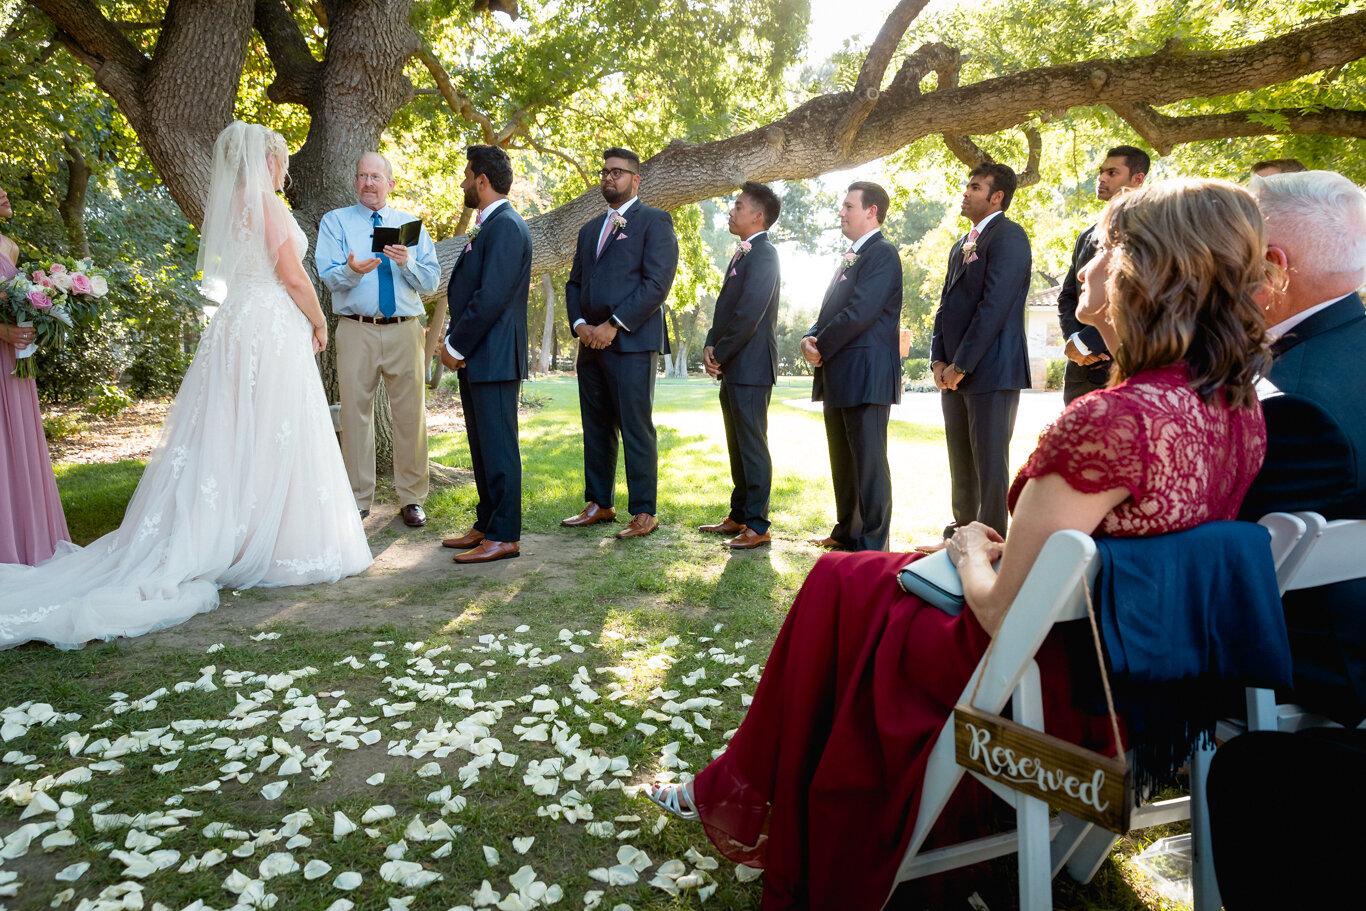 2019.08.24_Emily-Ashir-Wedding-at-the-Maples-5897.jpg